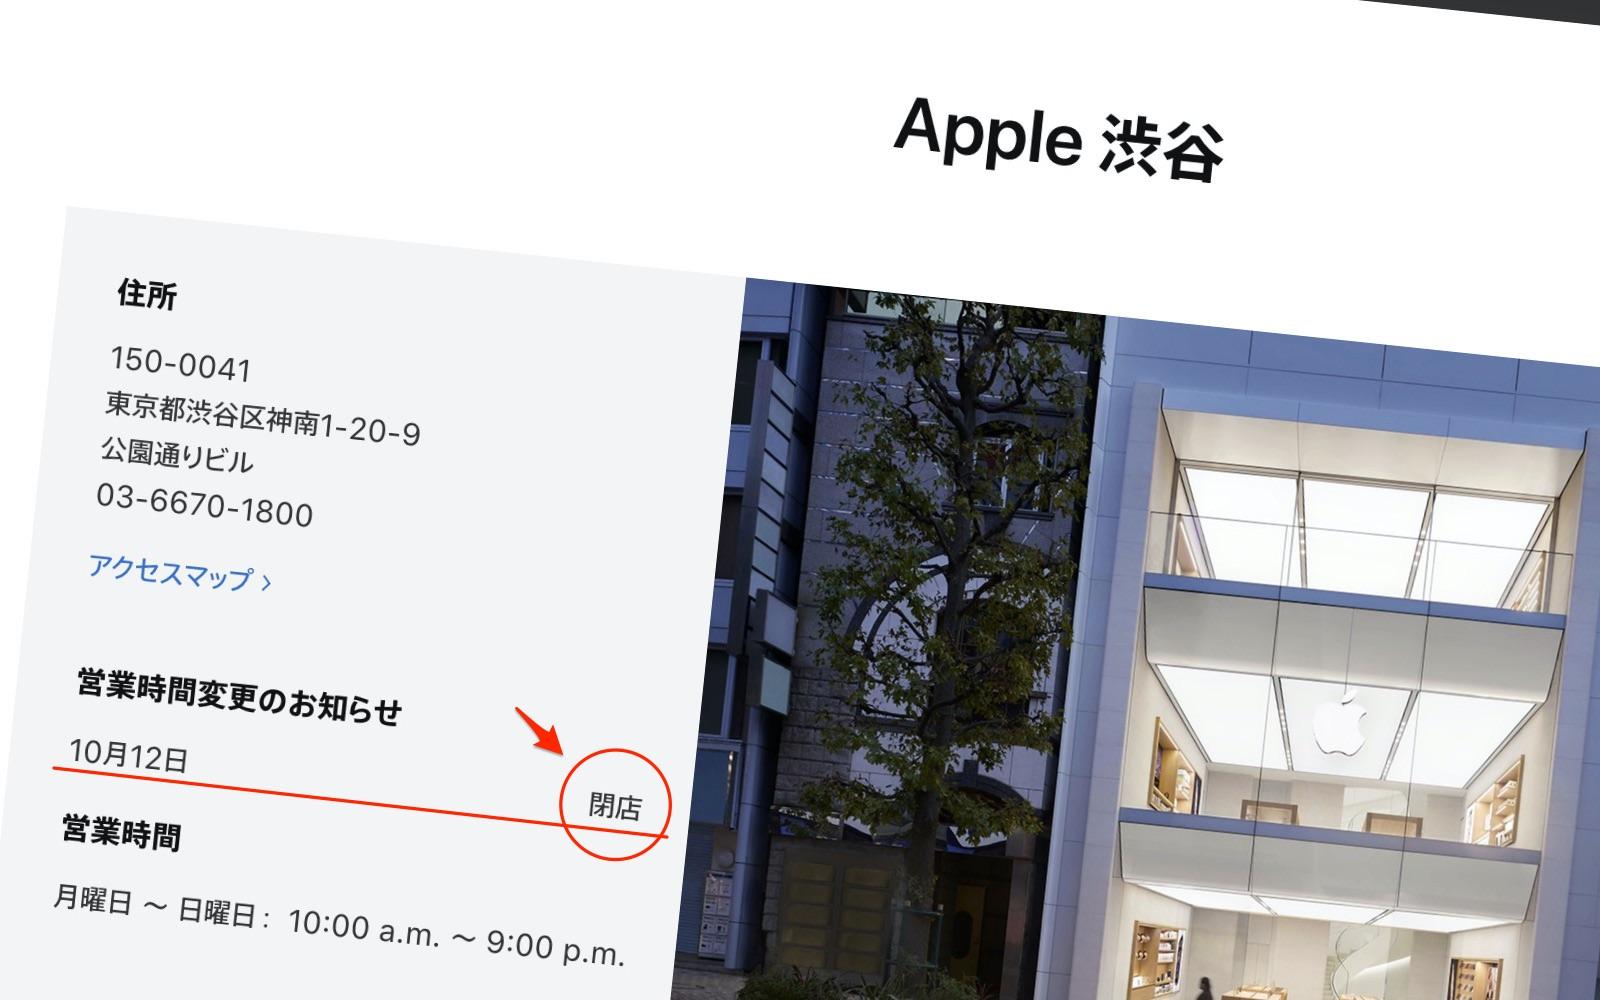 Apple Shibuya not open oct10 2